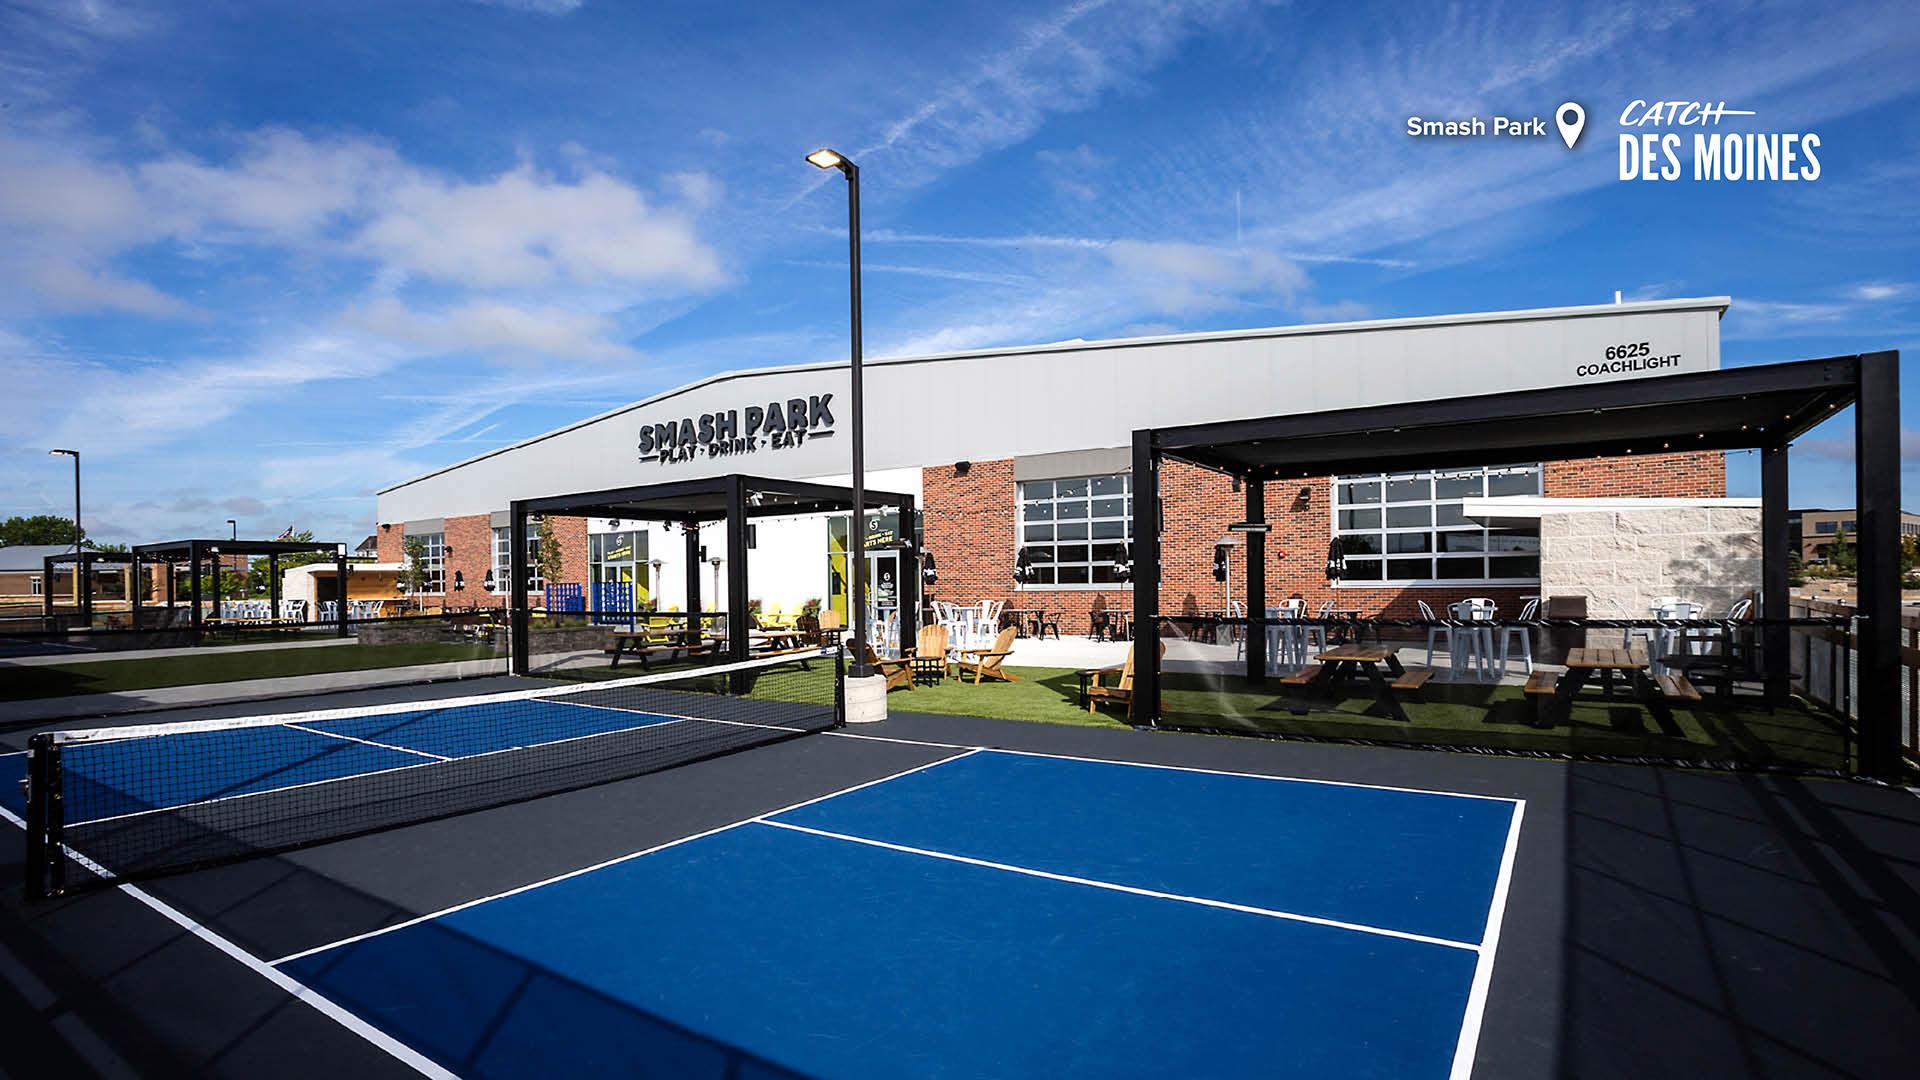 Smash Park Tennis Courts Zoom Background